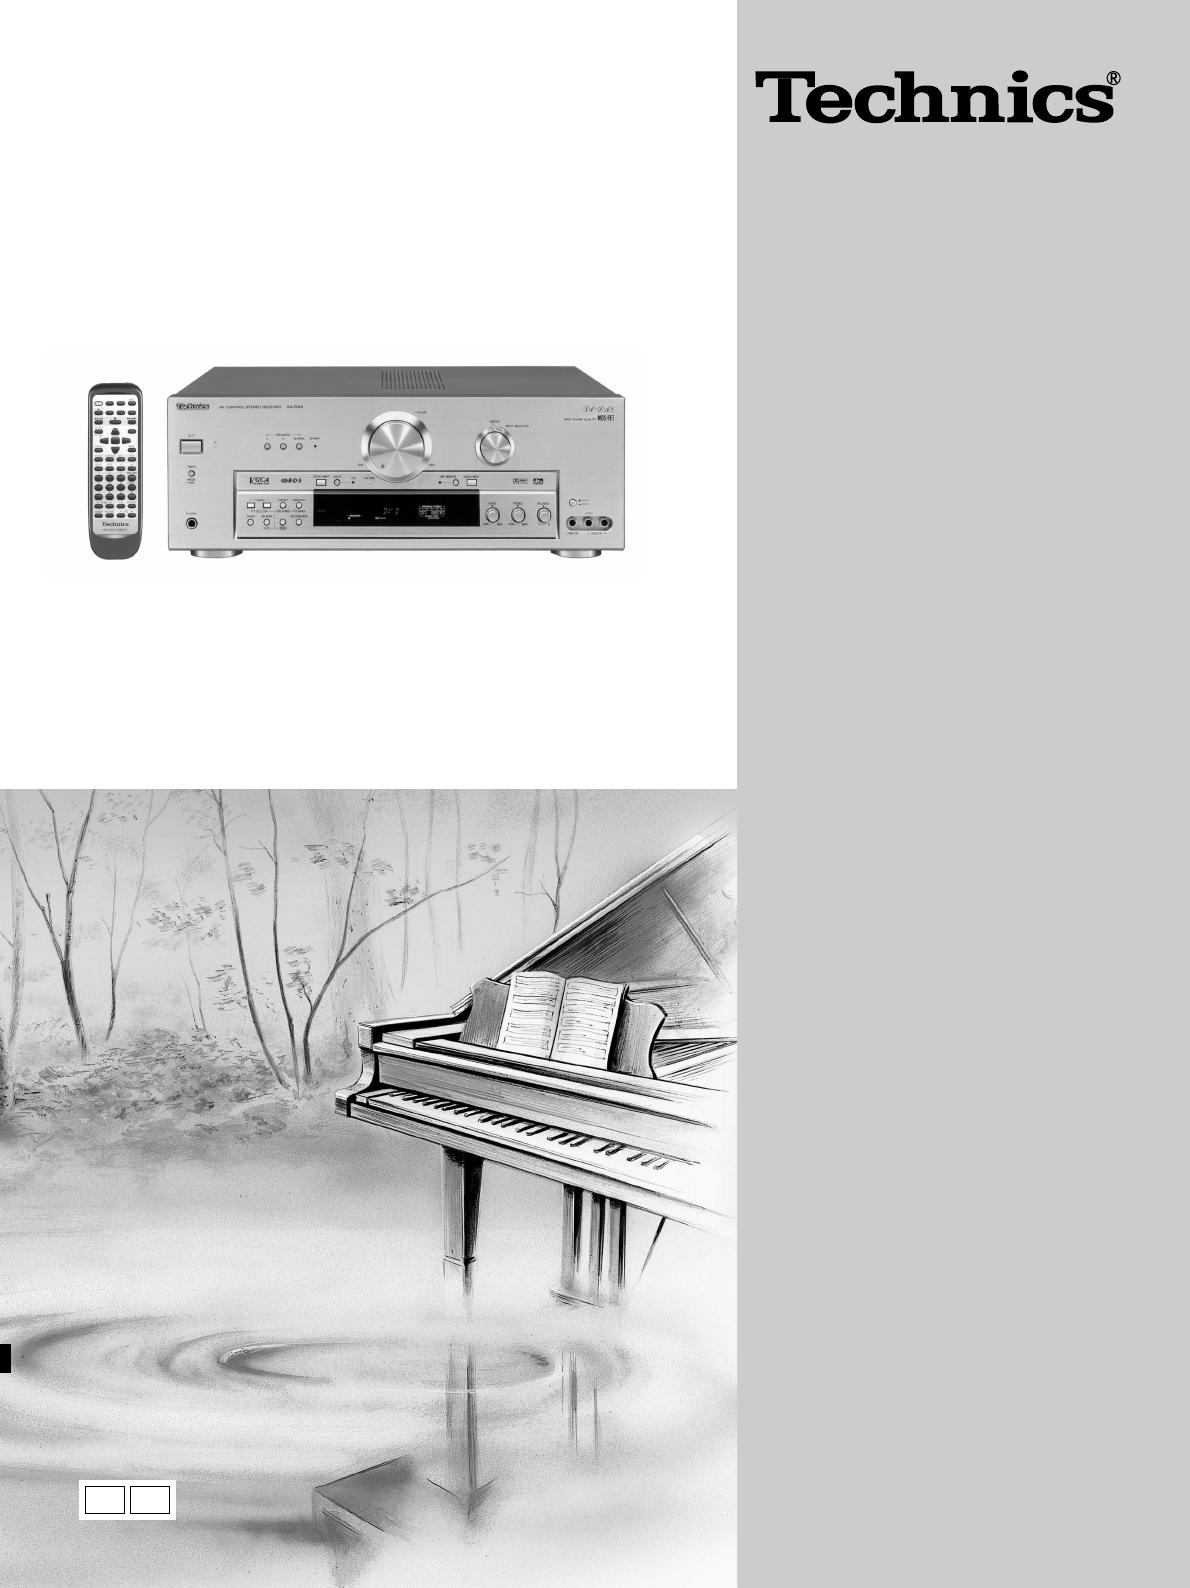 Handleiding Technics Sa Da10 Pagina 1 Van 52 English Home Stereo Wiring Diagram Av Control Receiver